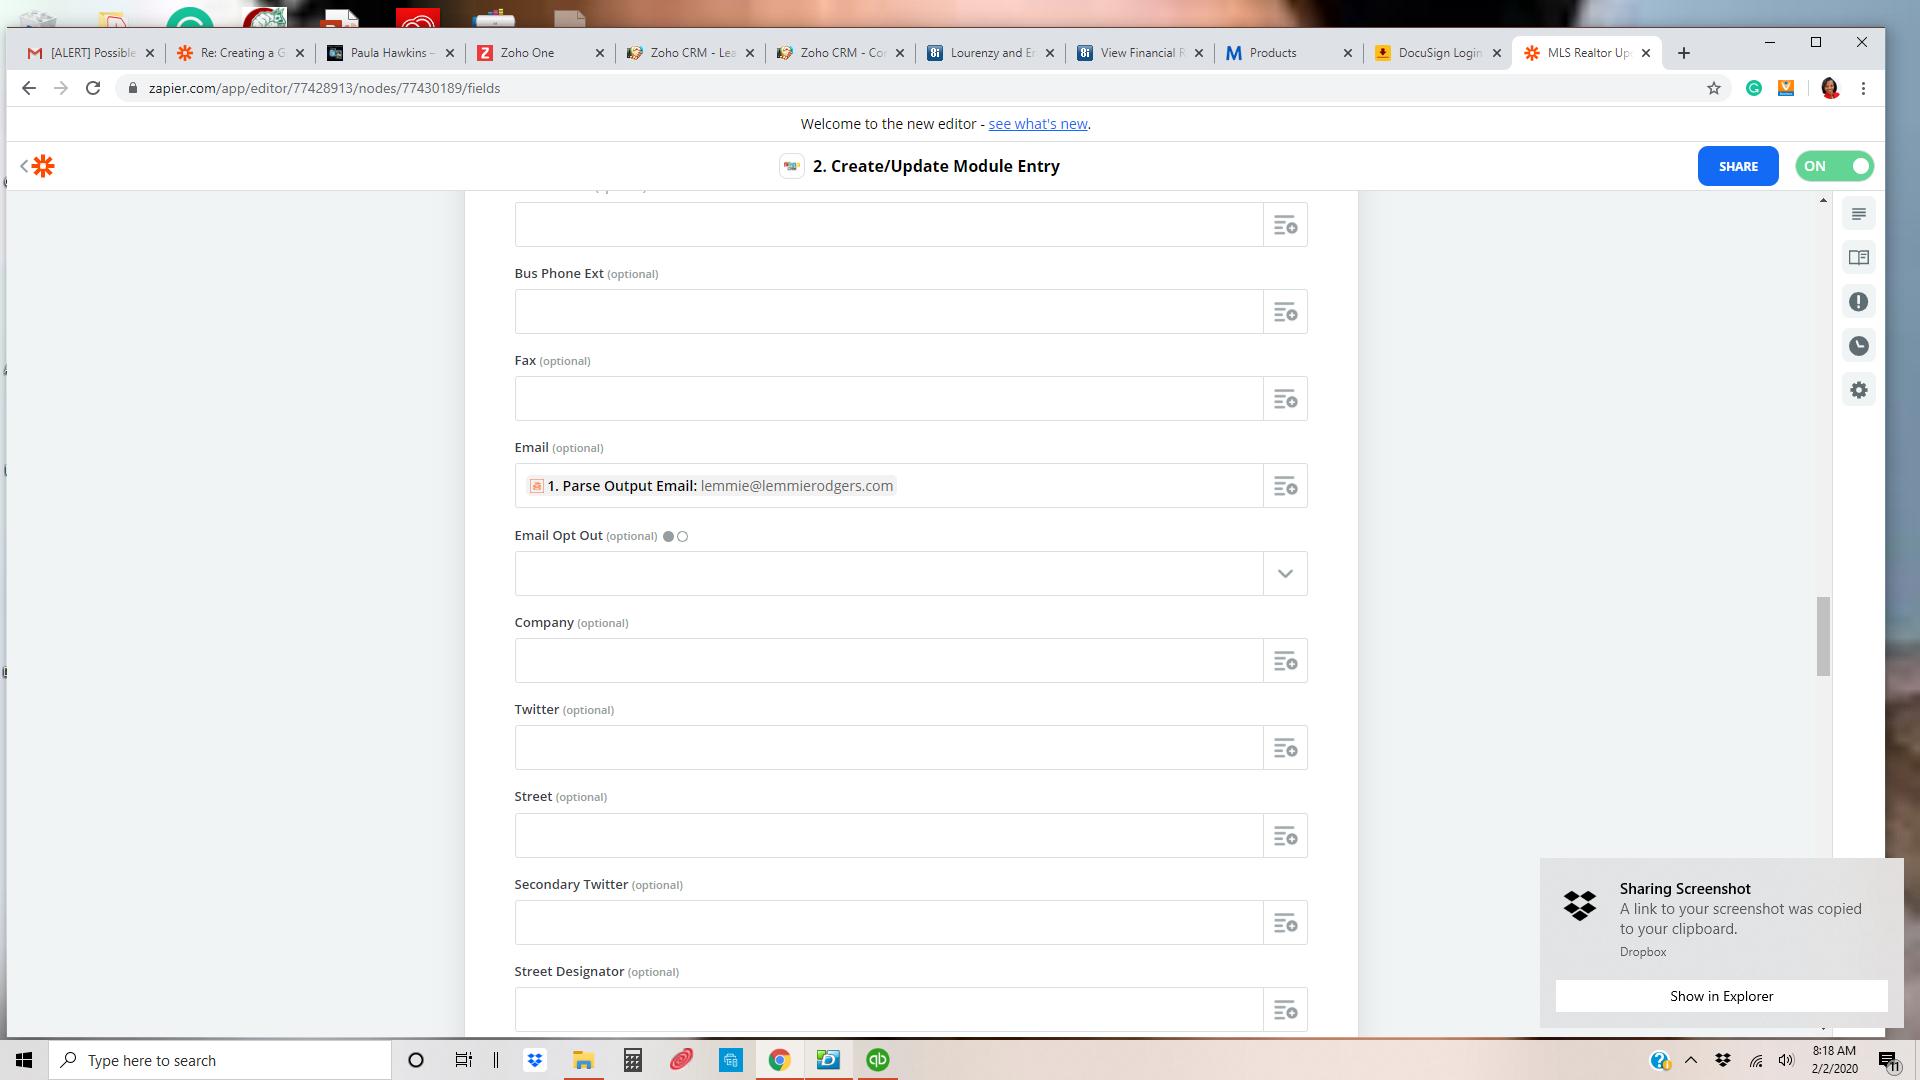 Screenshot 2020-02-02 08.18.36.png